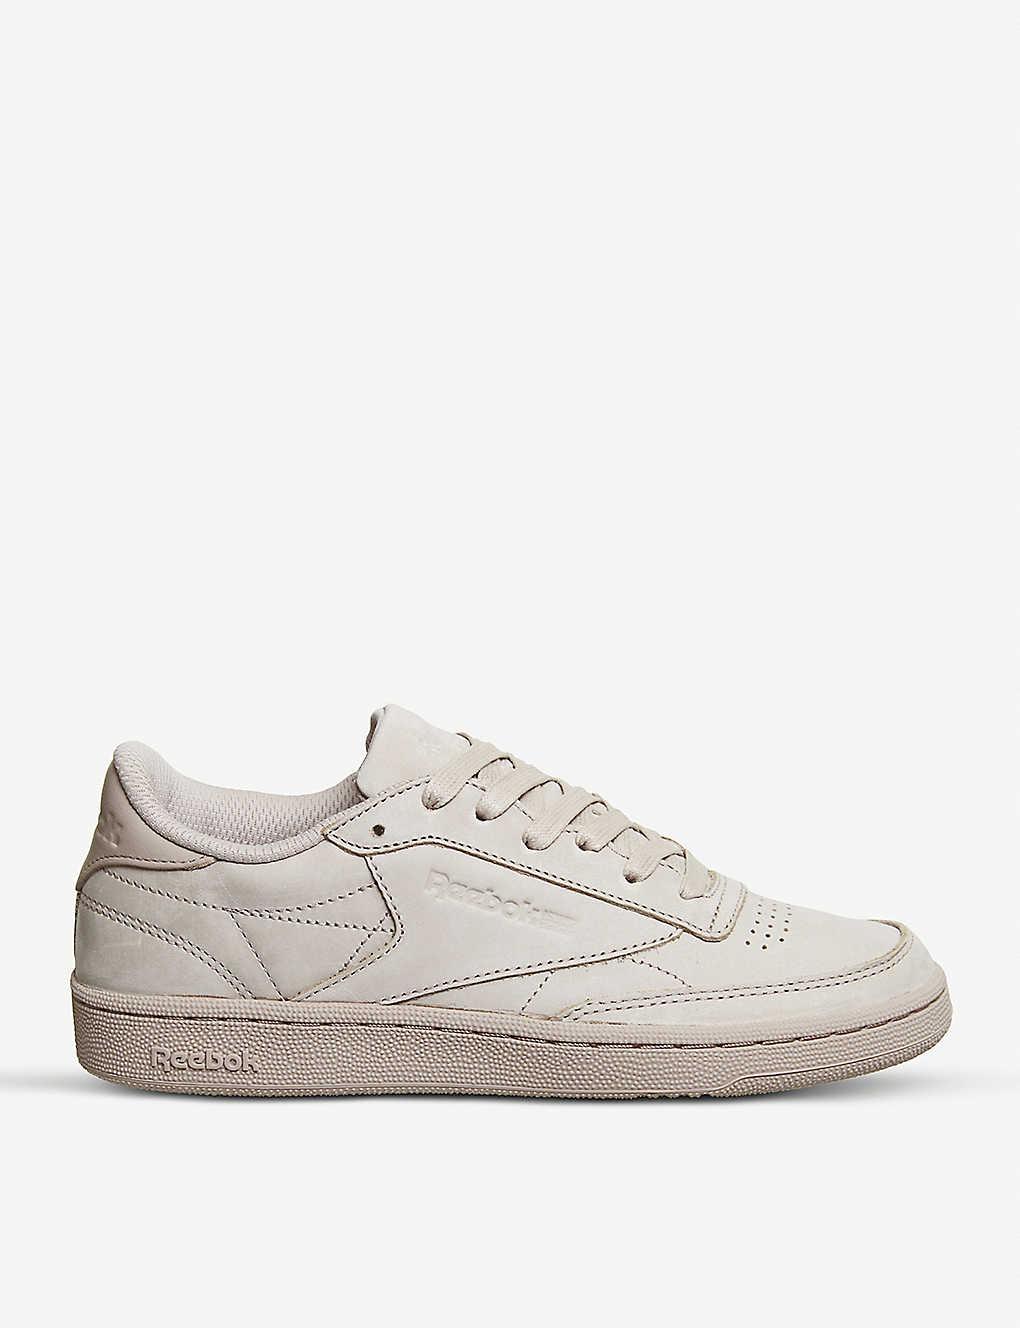 d58e53da0033 REEBOK - Club C 85 low-top leather trainers